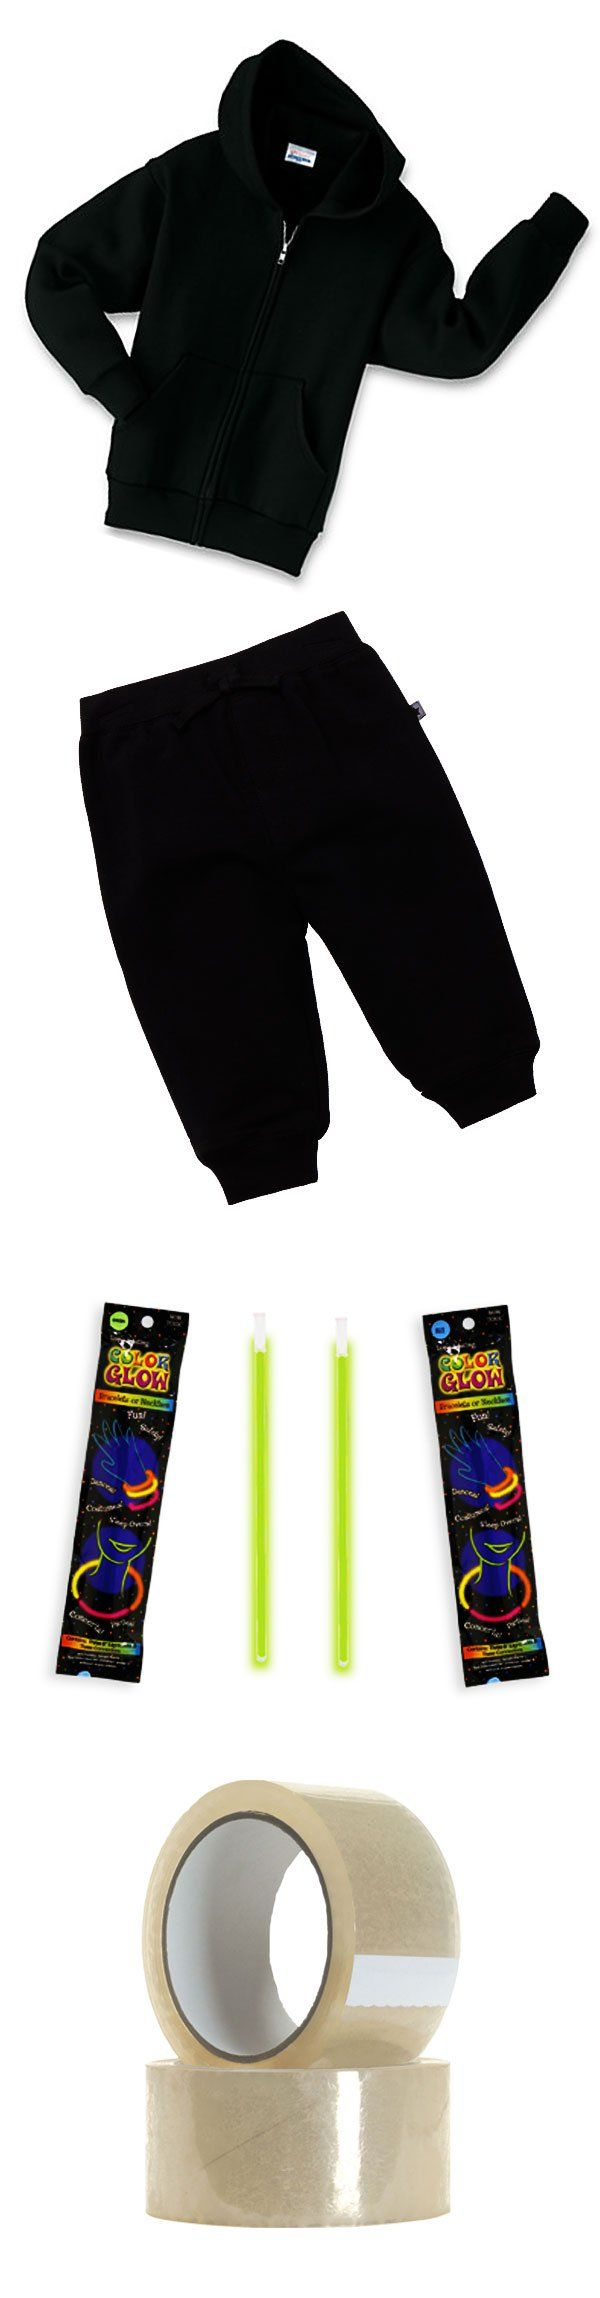 glow-stick-costume-diy-materials-needed-ctr